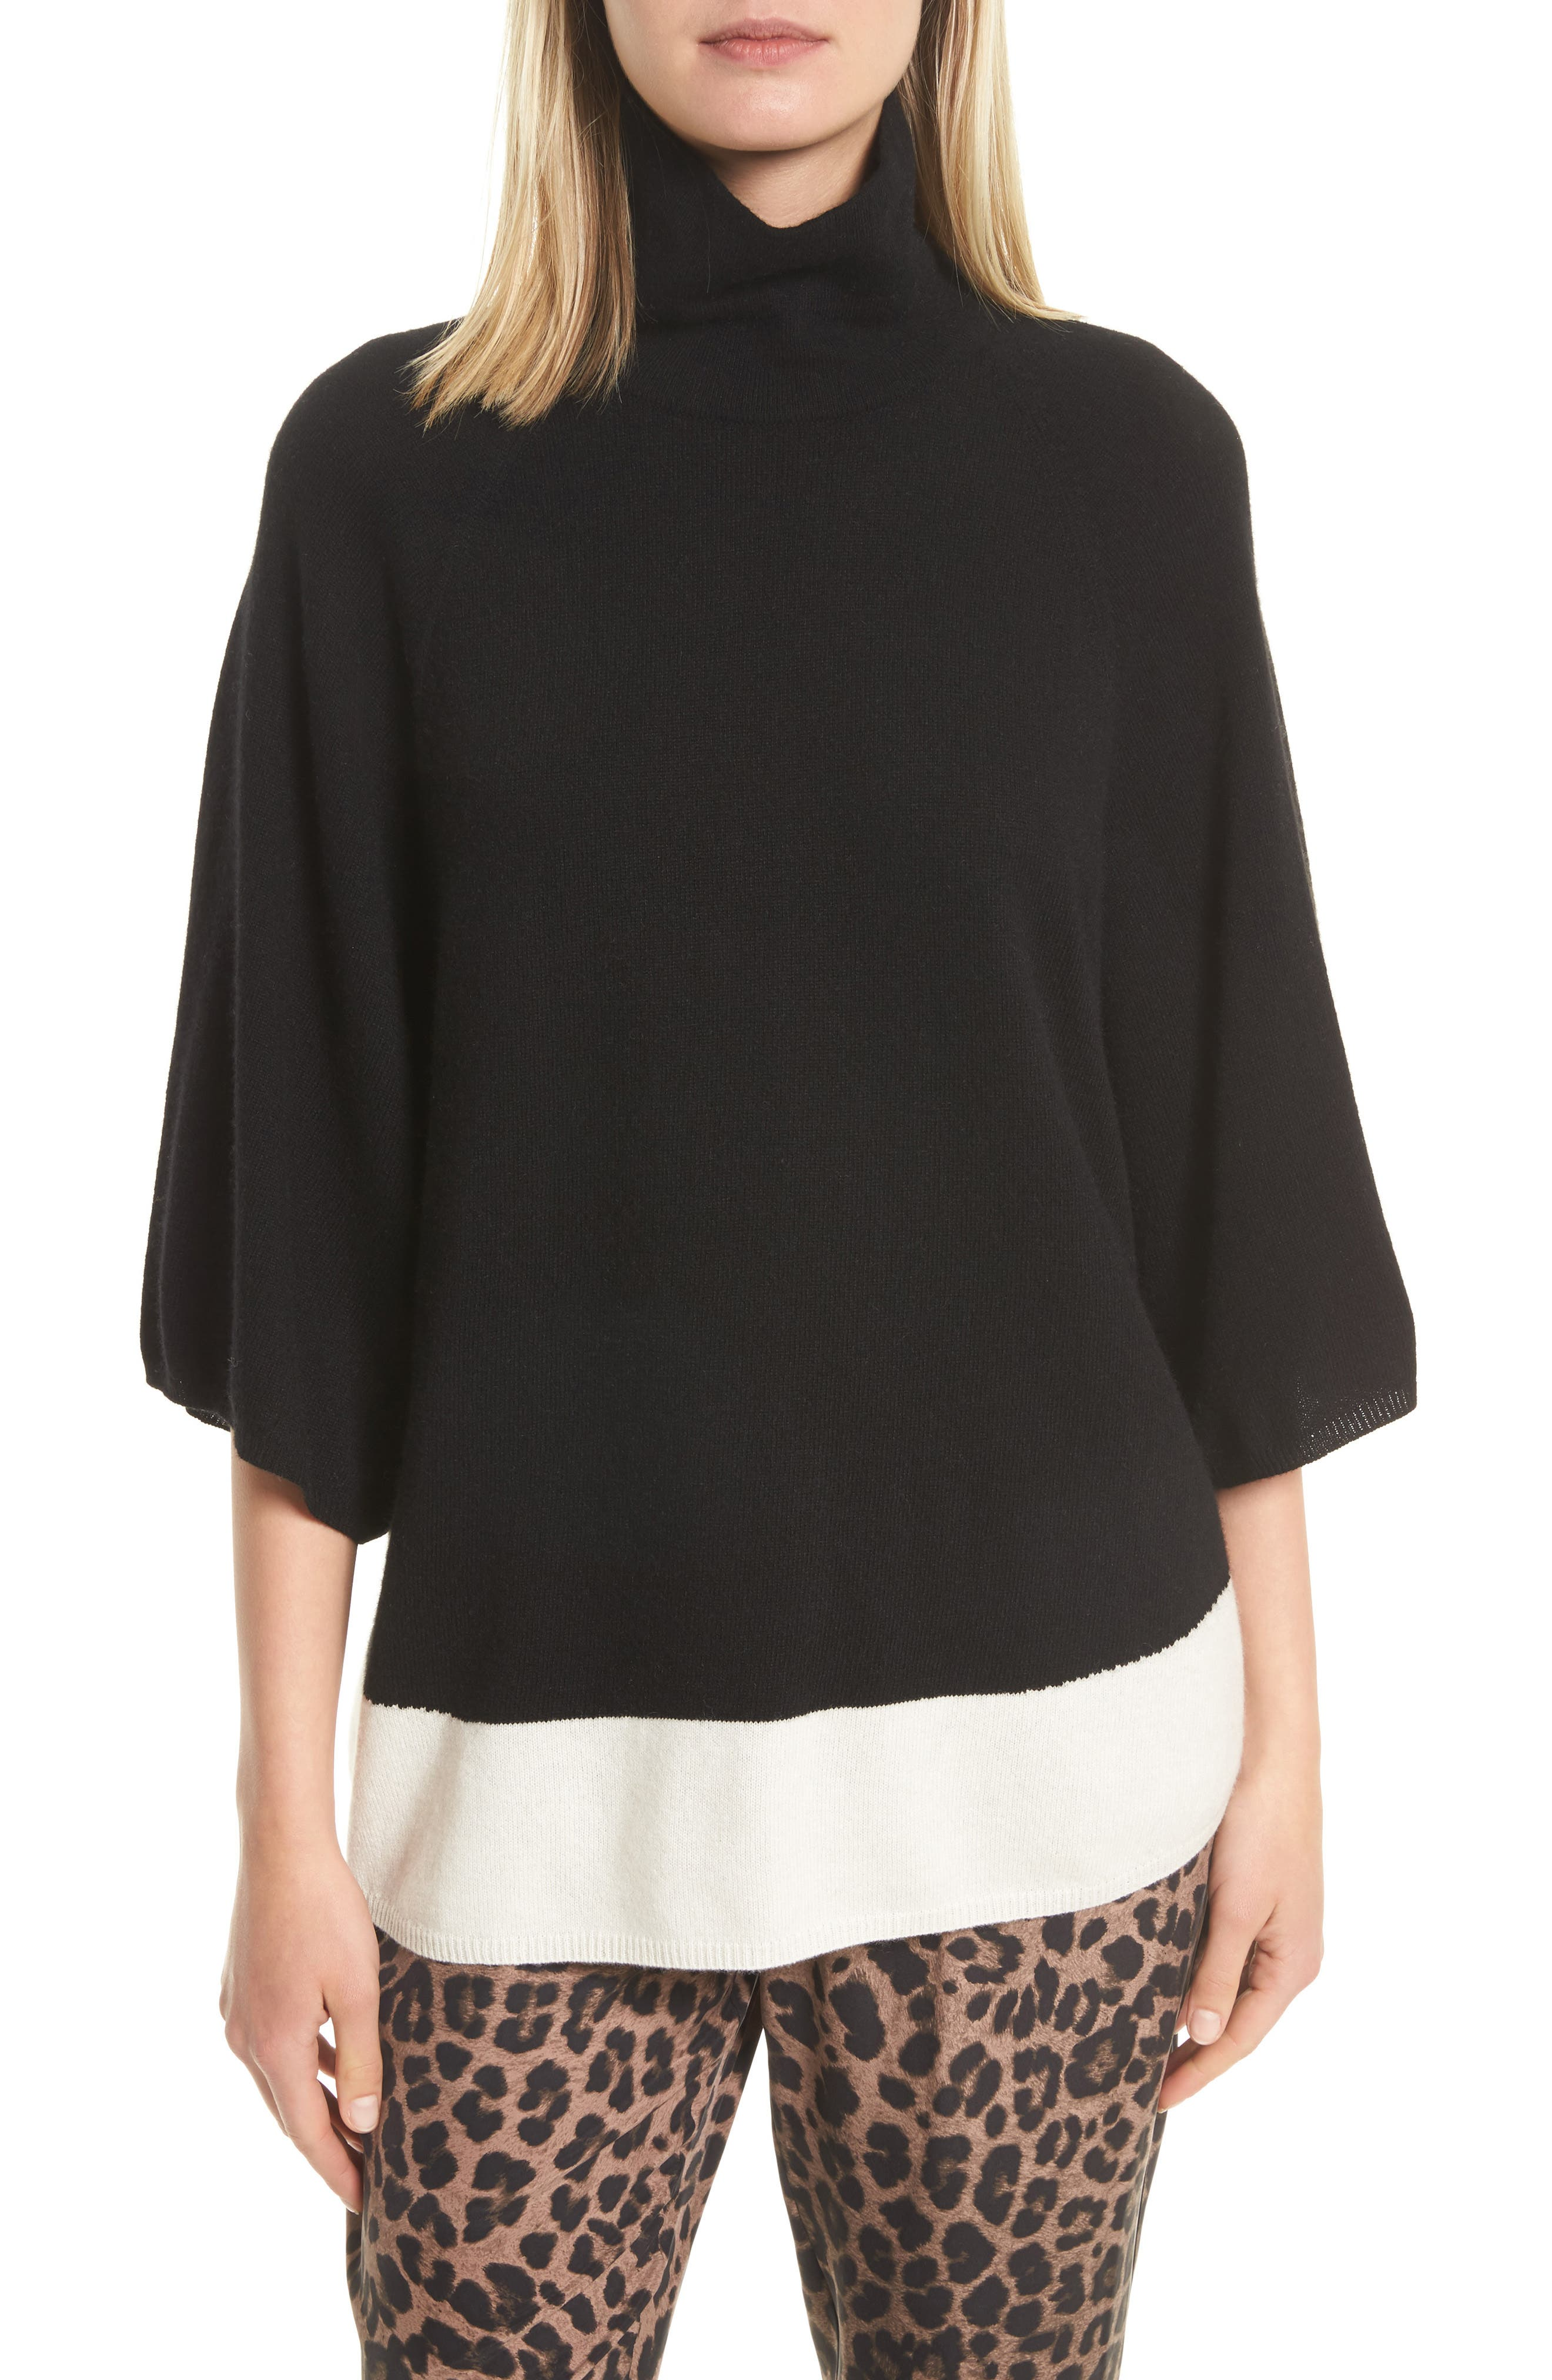 Celia G Wool & Cashmere Sweater,                             Main thumbnail 1, color,                             004